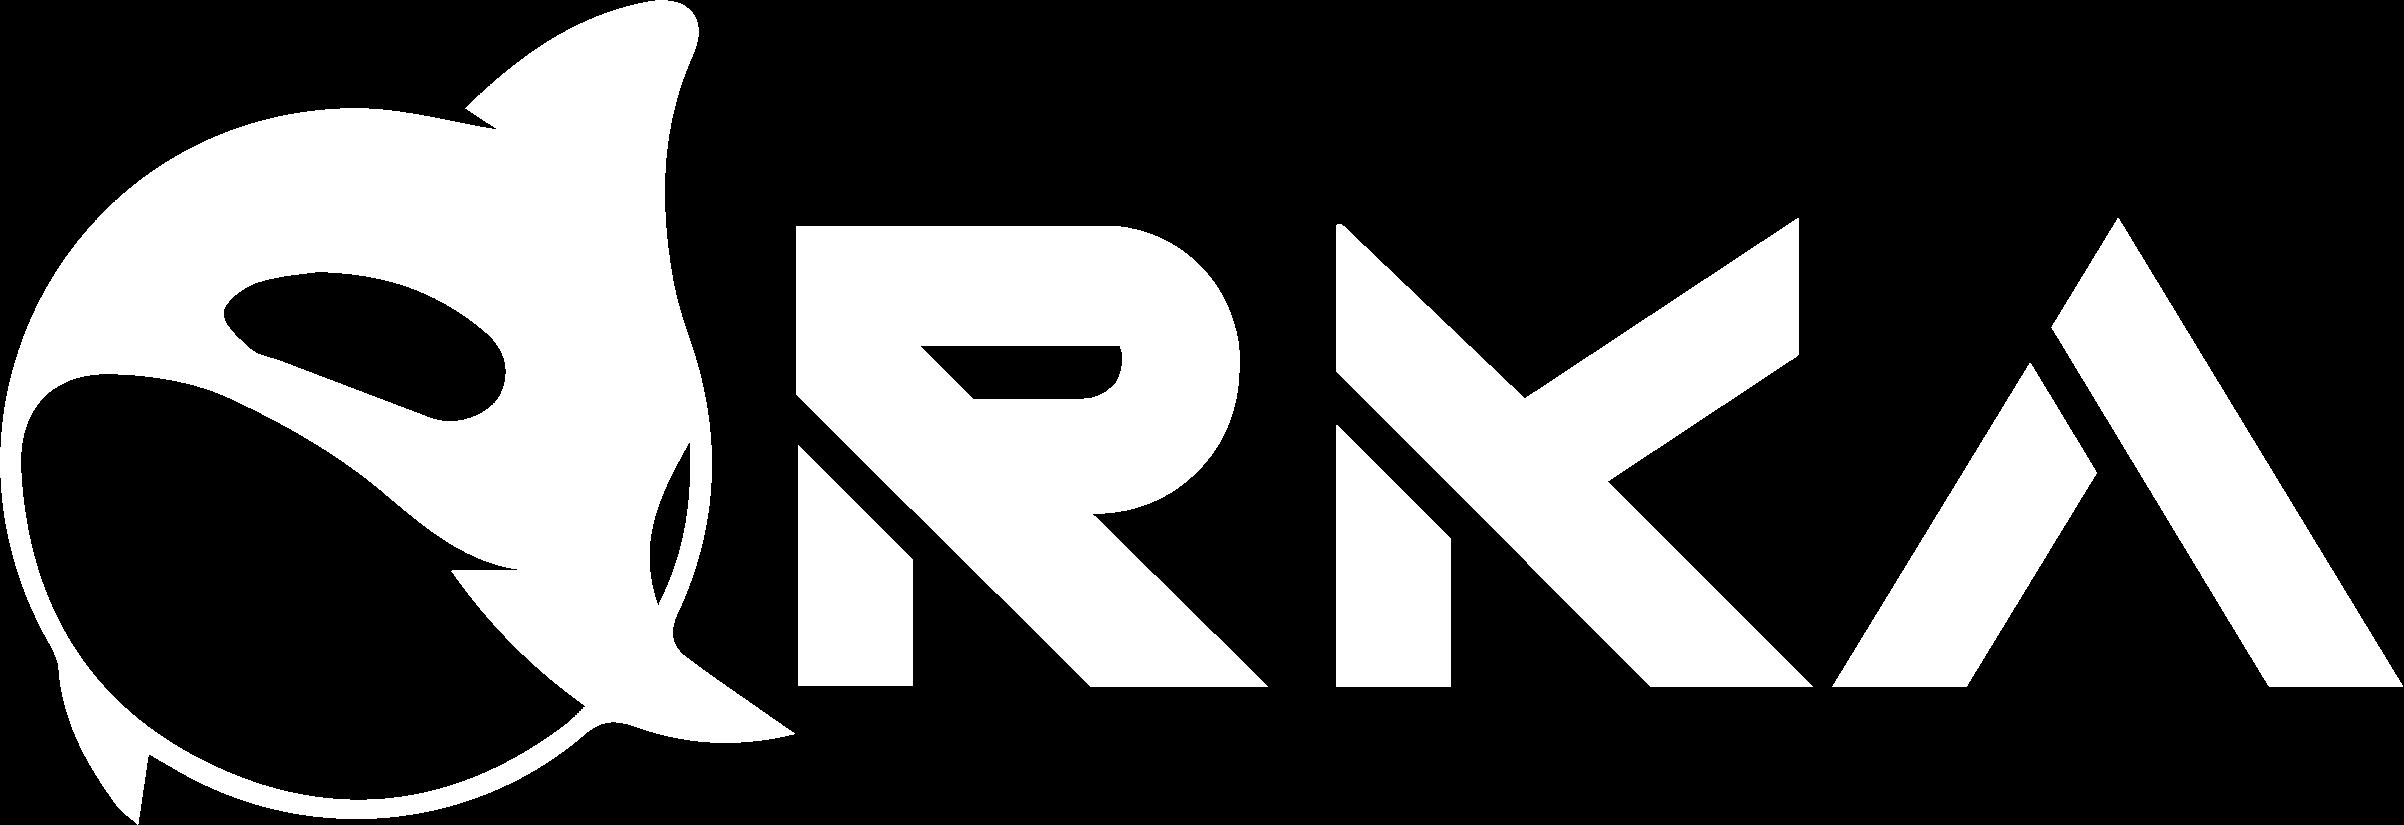 ORKA stakepool